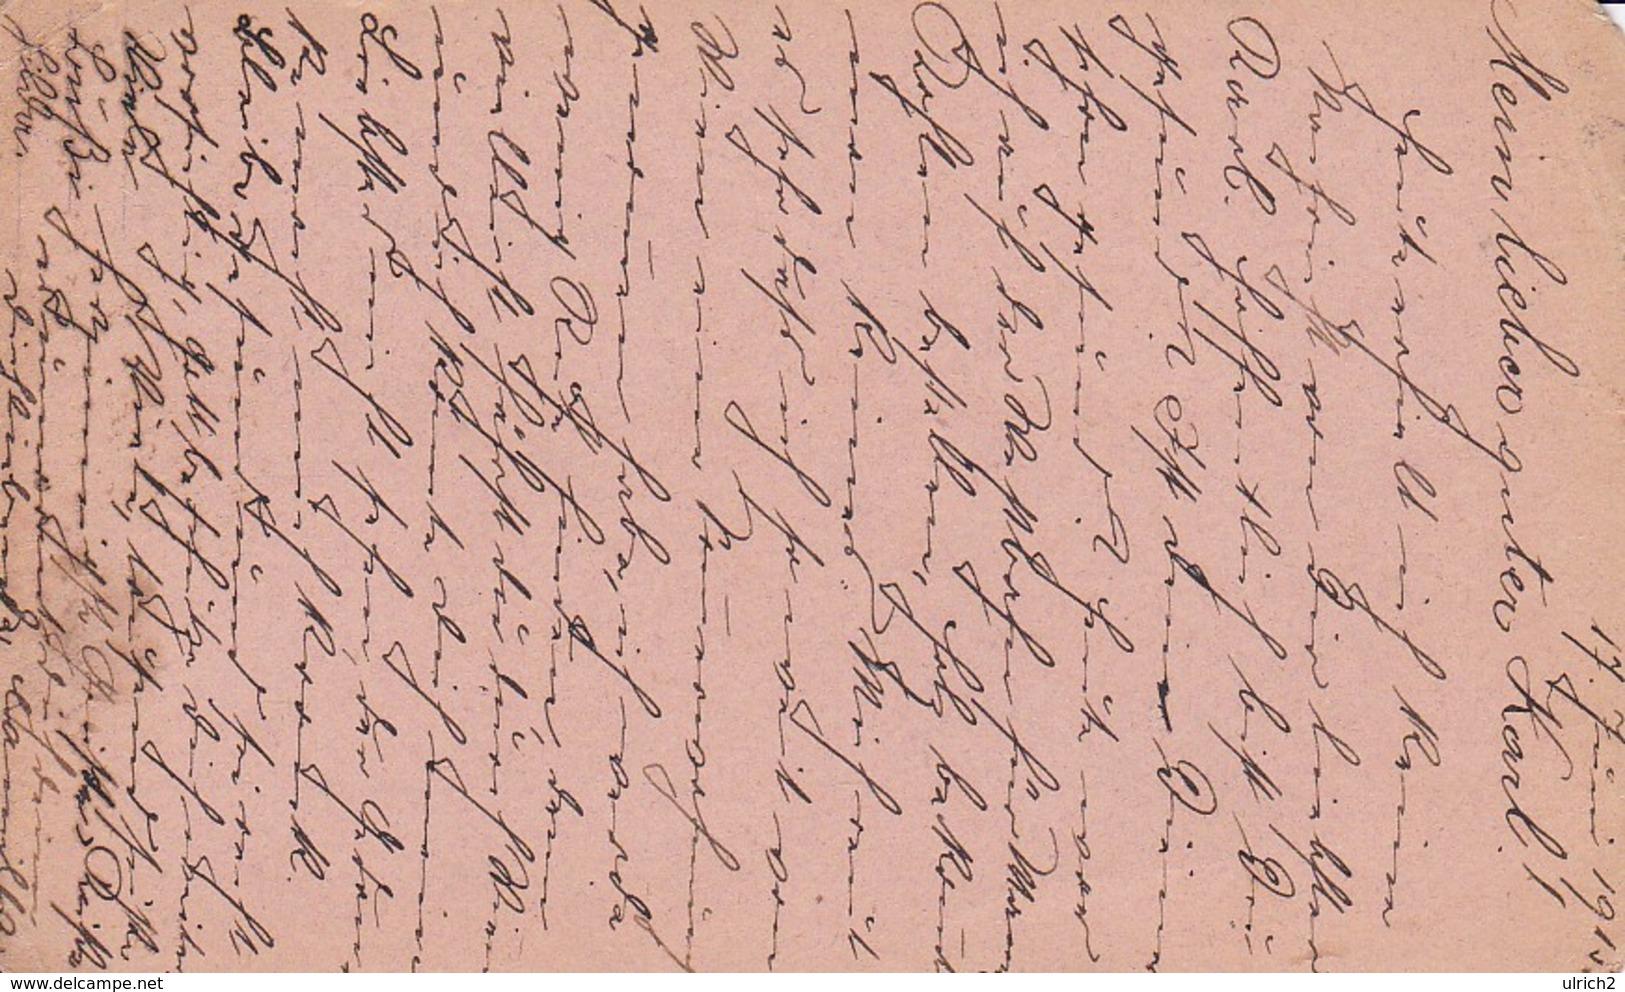 Feldpostkarte - Wien An Korpstraingruppen Kom. 3/19 - 1915 (39318) - Briefe U. Dokumente